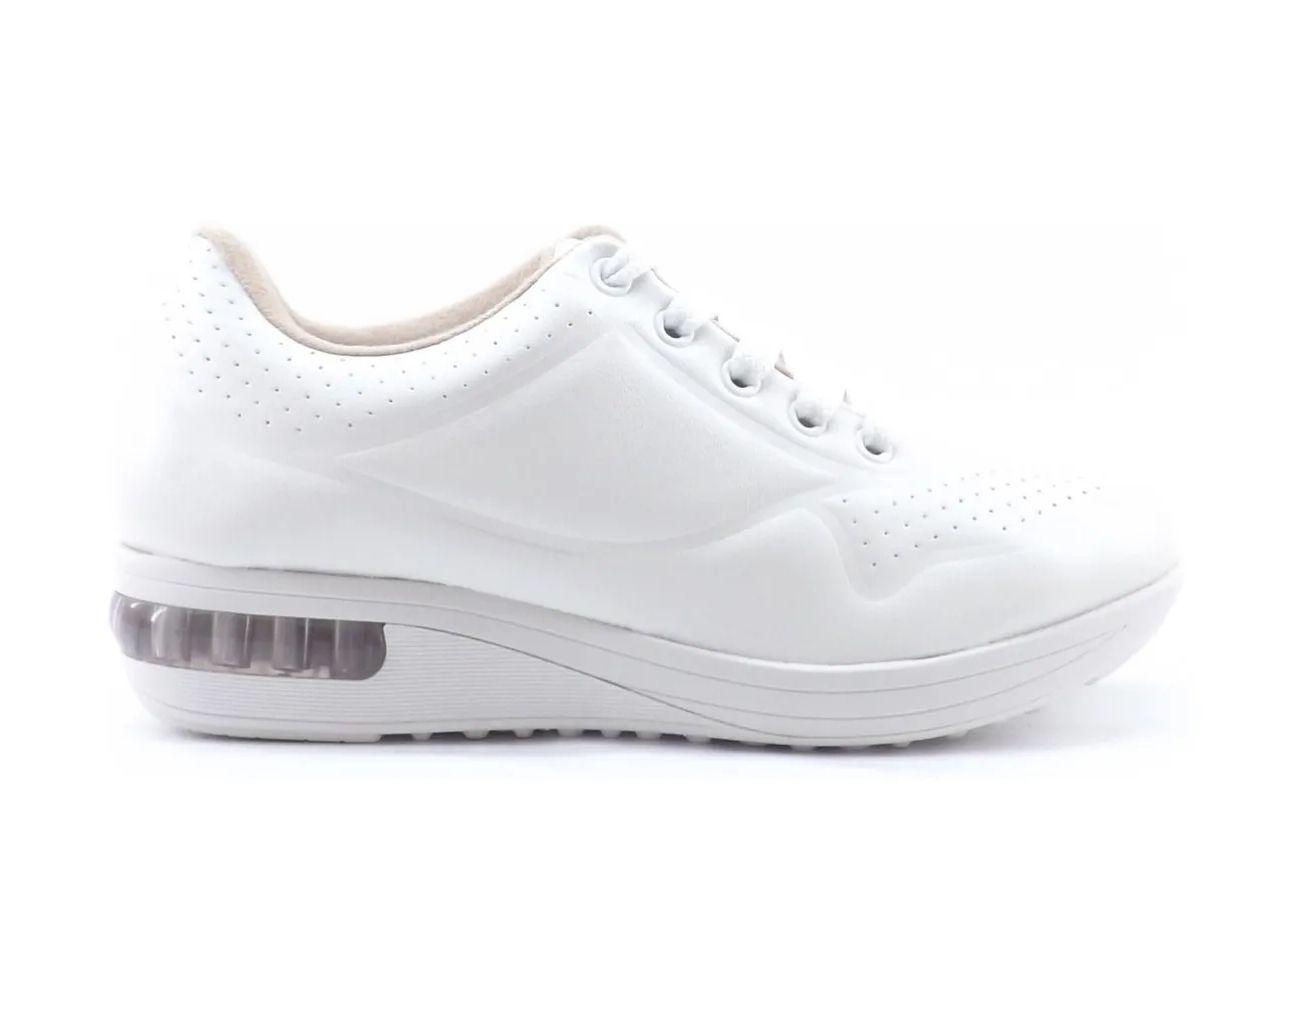 Tenis Feminino Modare Ultra Conforto com Amortecedor Branco Napa Cristalina 7320112